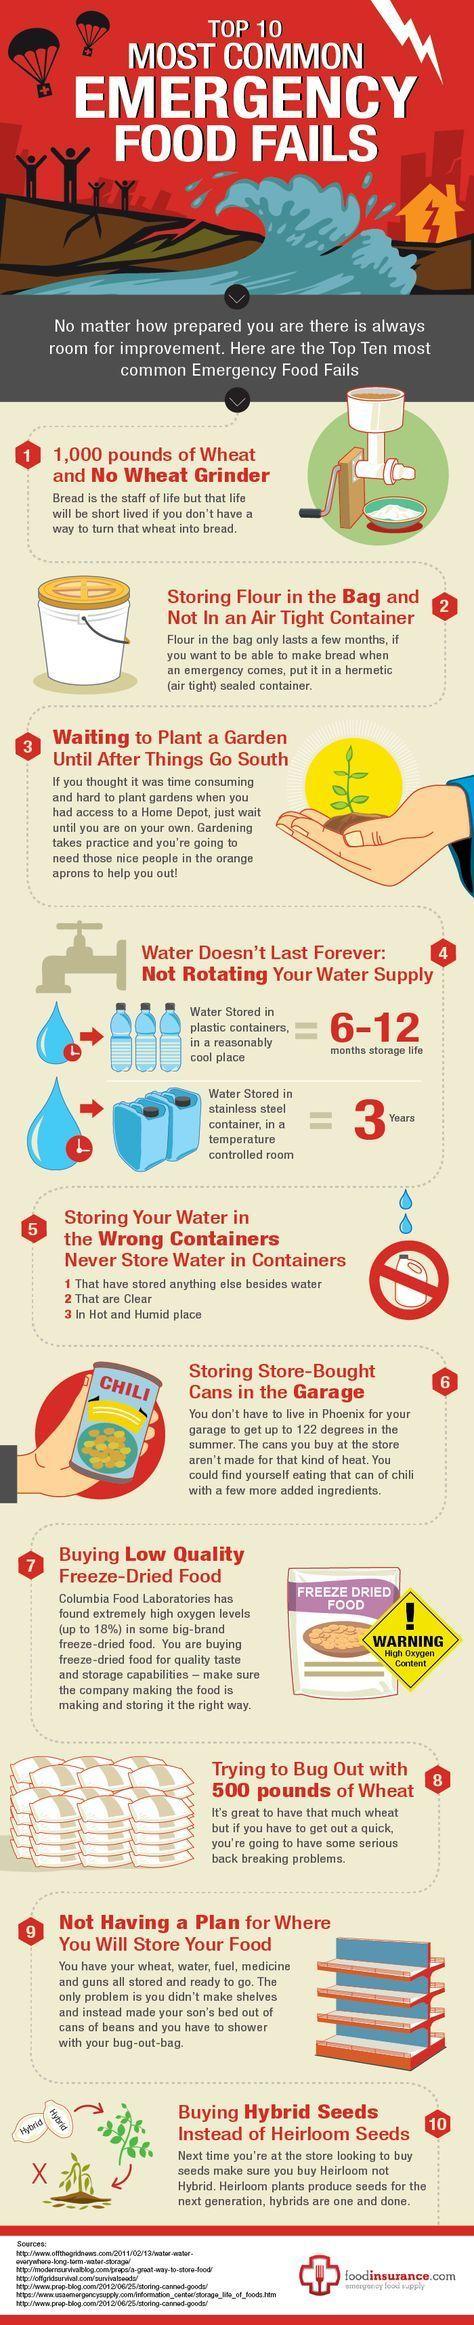 Emergency Planning: Common Preparedness Mistakes